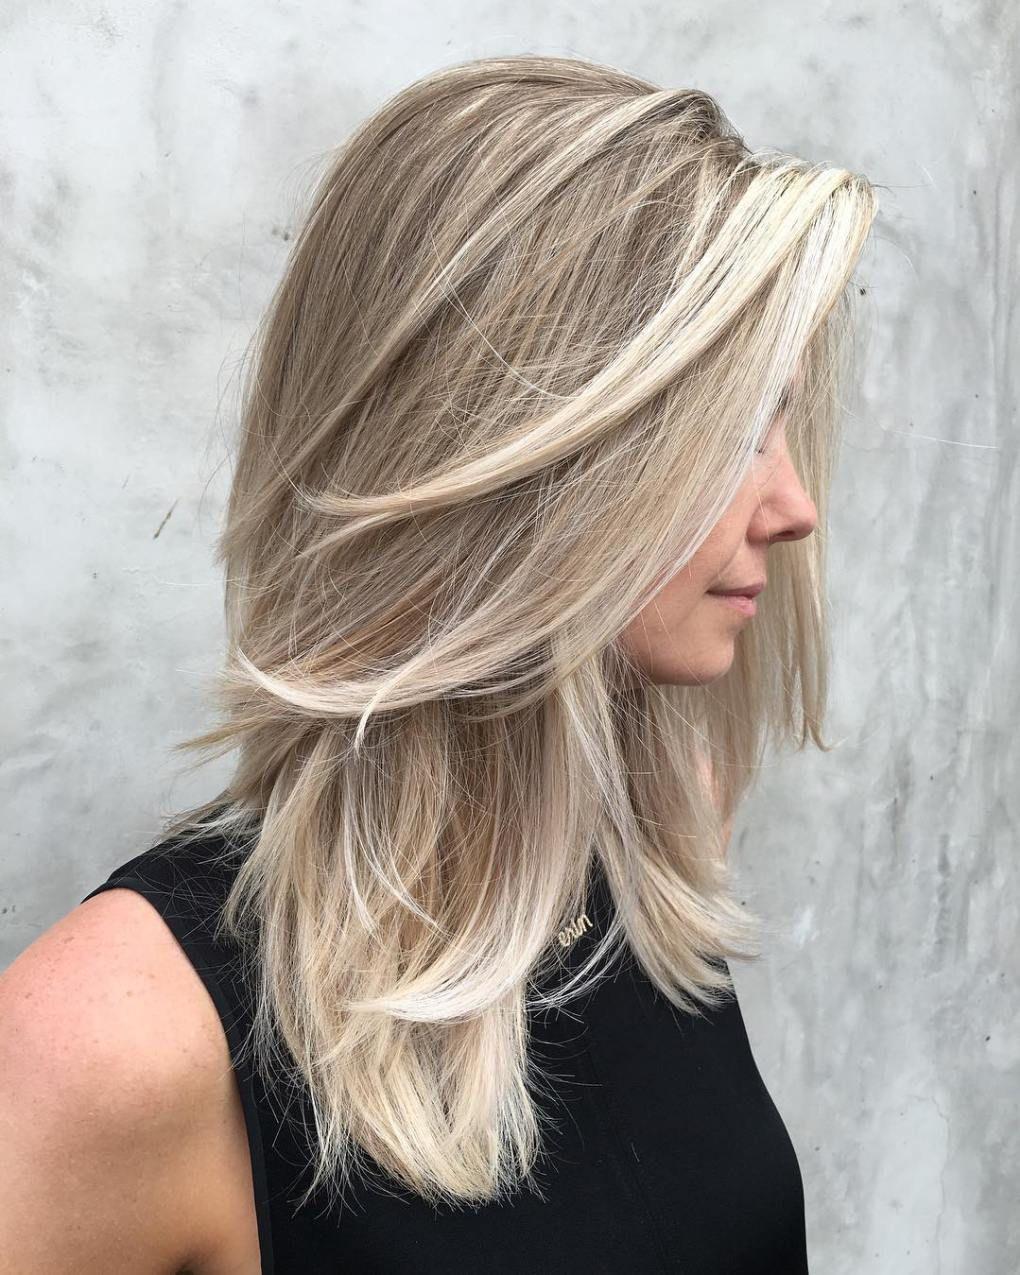 Medium Ash Blonde Balayage Hairstyle Hair Styles Long Thin Hair Long Hair Styles